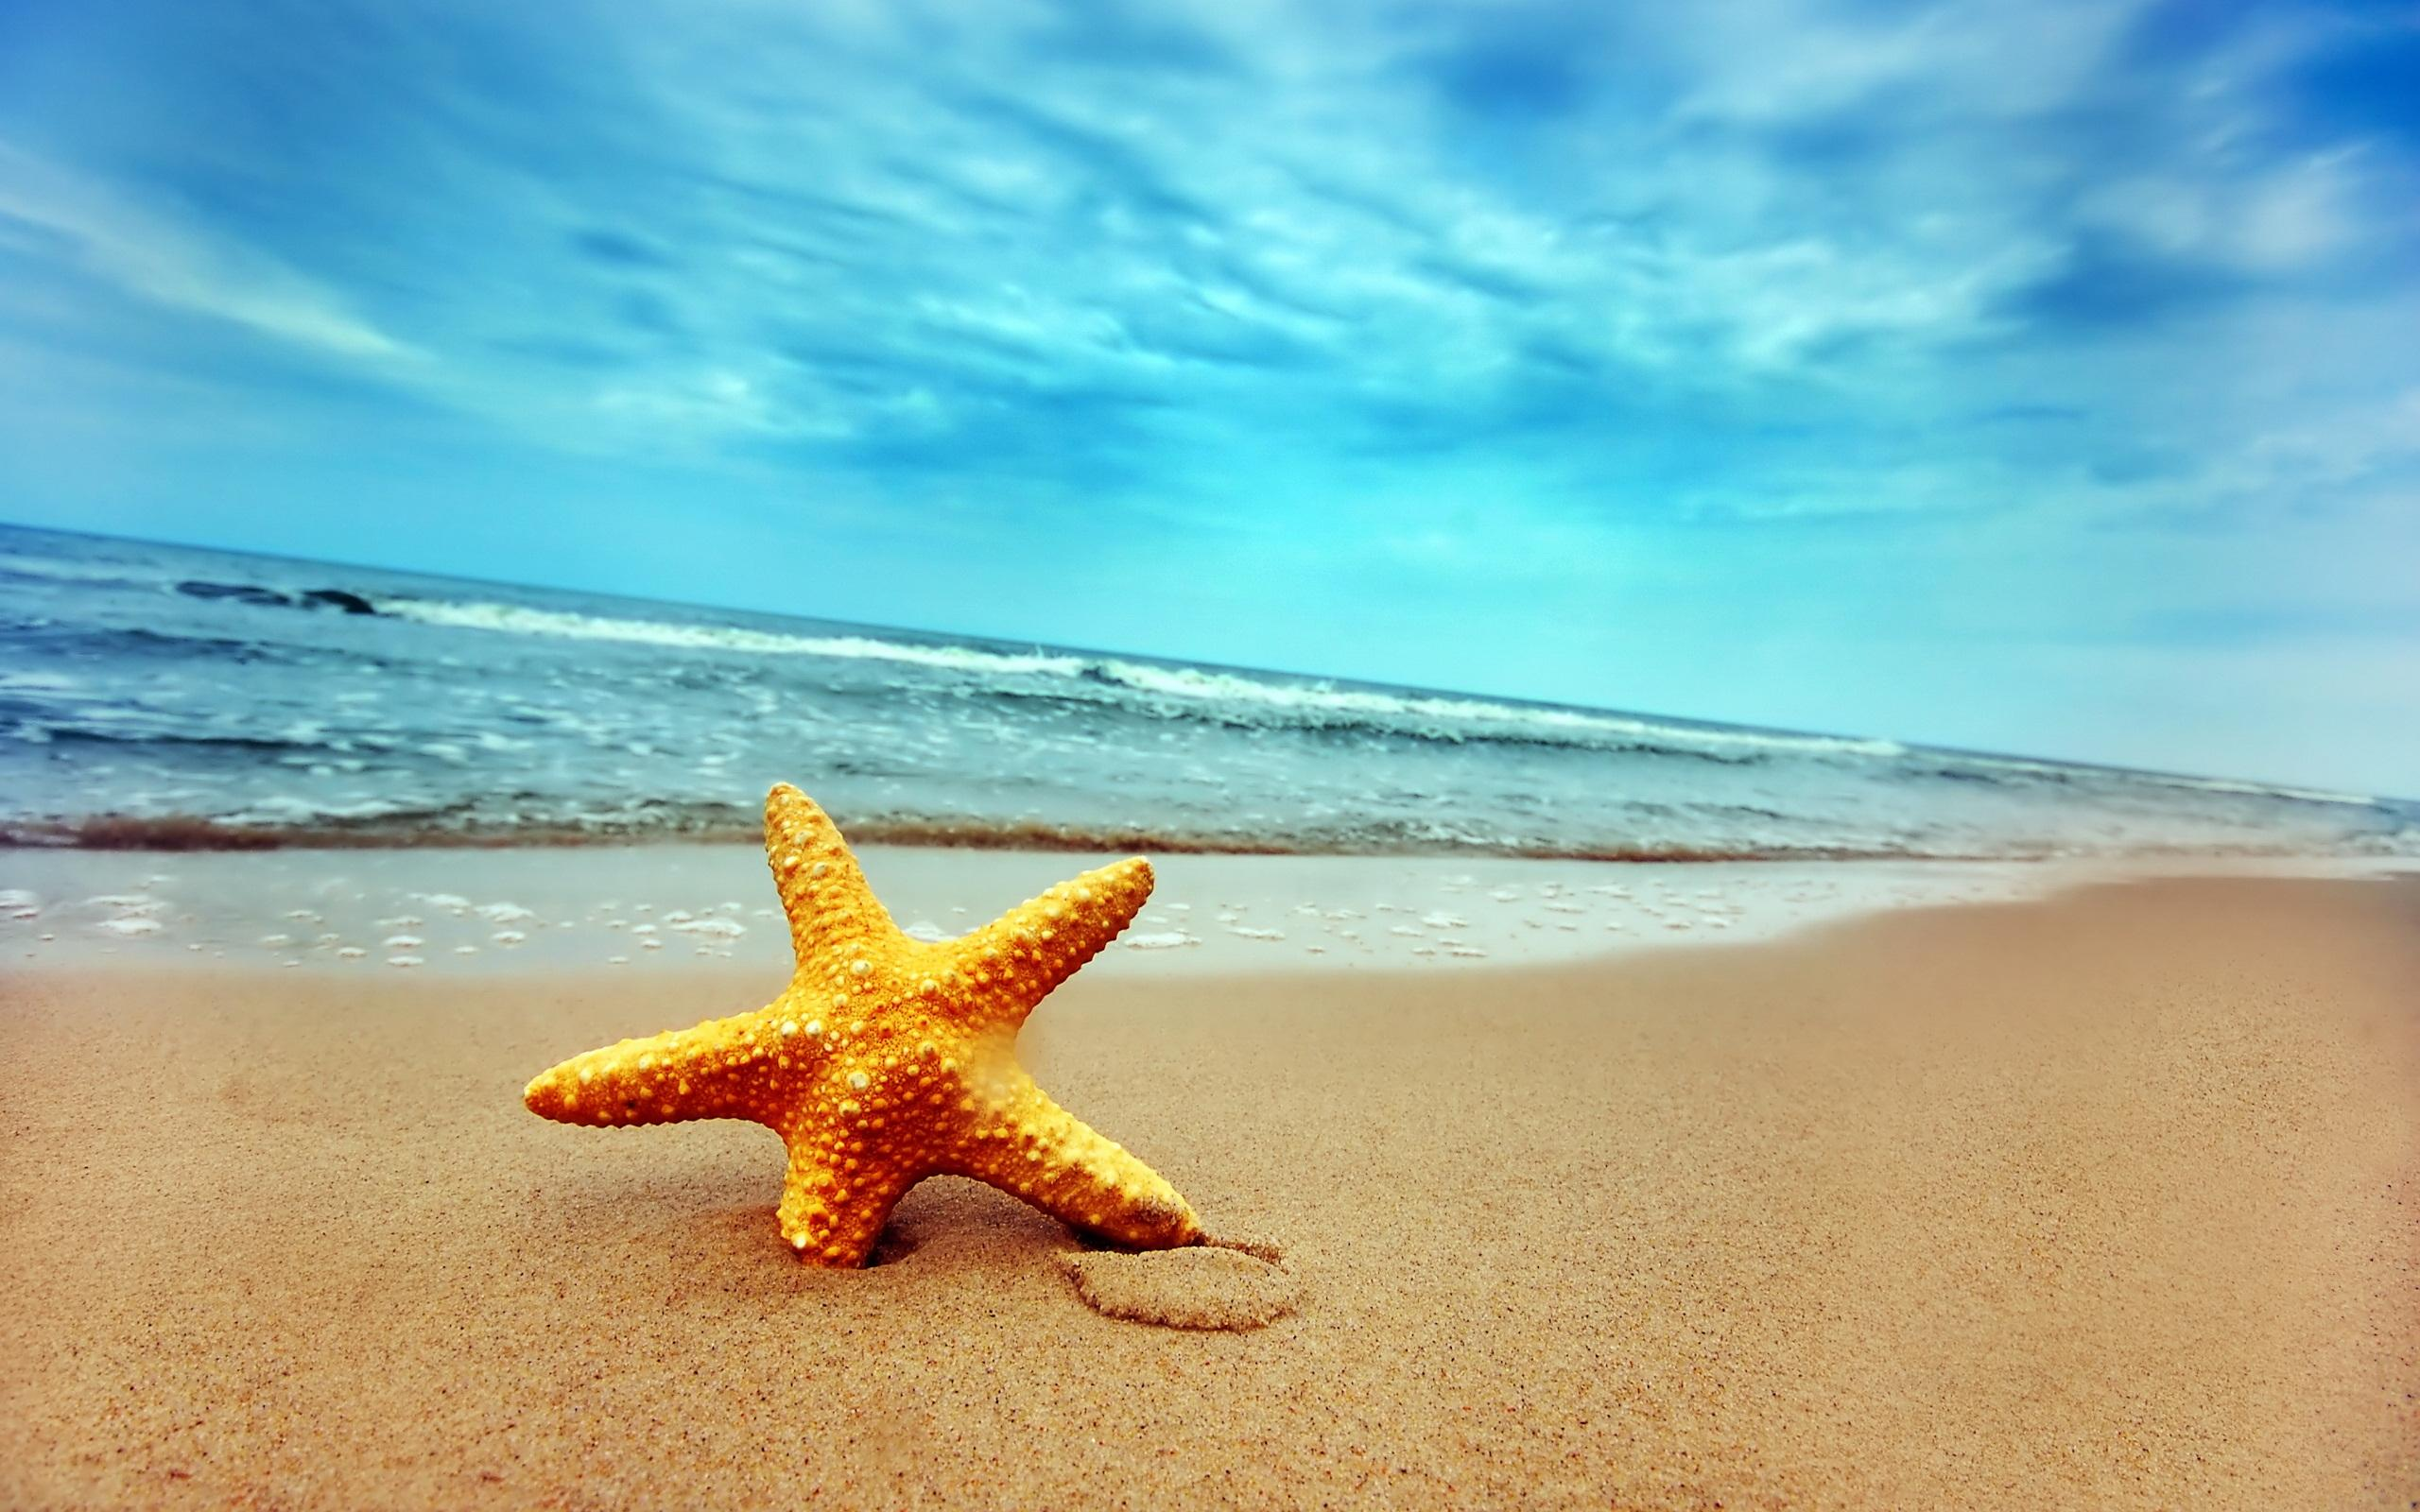 Starfish on Beach Desktop Wallpaper Background Desktop Wallpaper 2560x1600